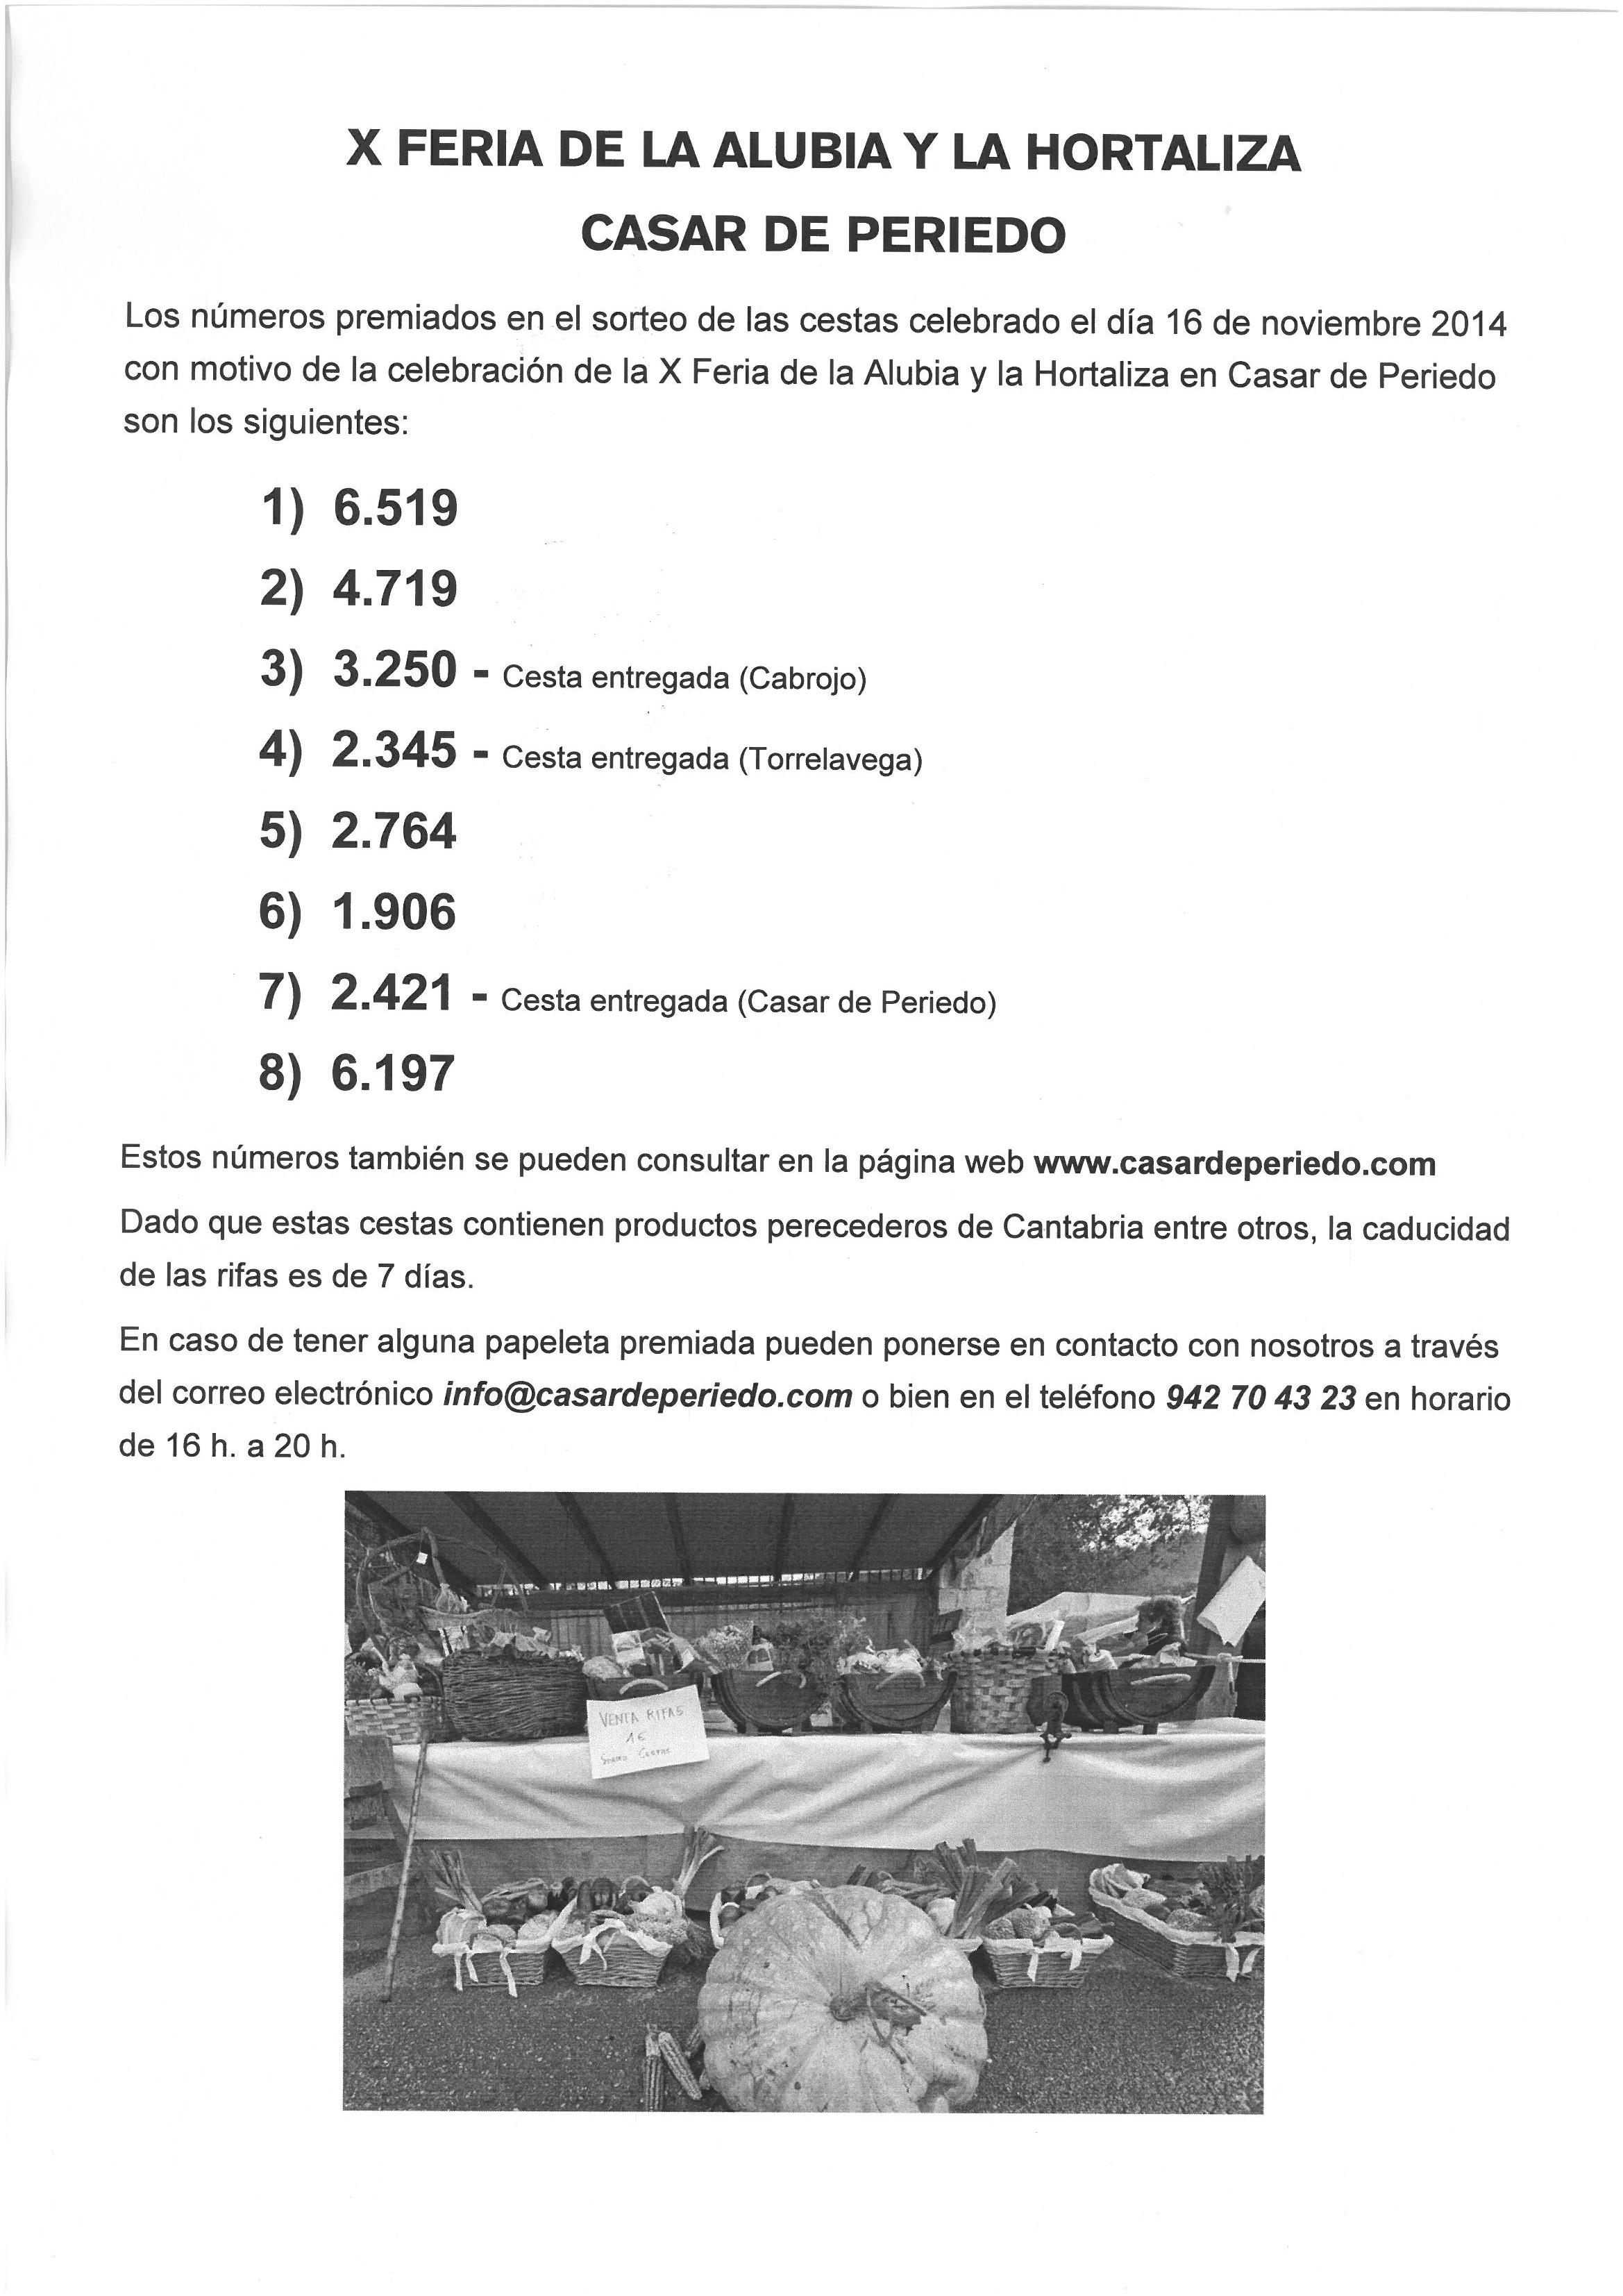 http://www.cabezondelasal.net/wp-content/uploads/2014/11/SKMBT_C224e14112109360_0001.jpg